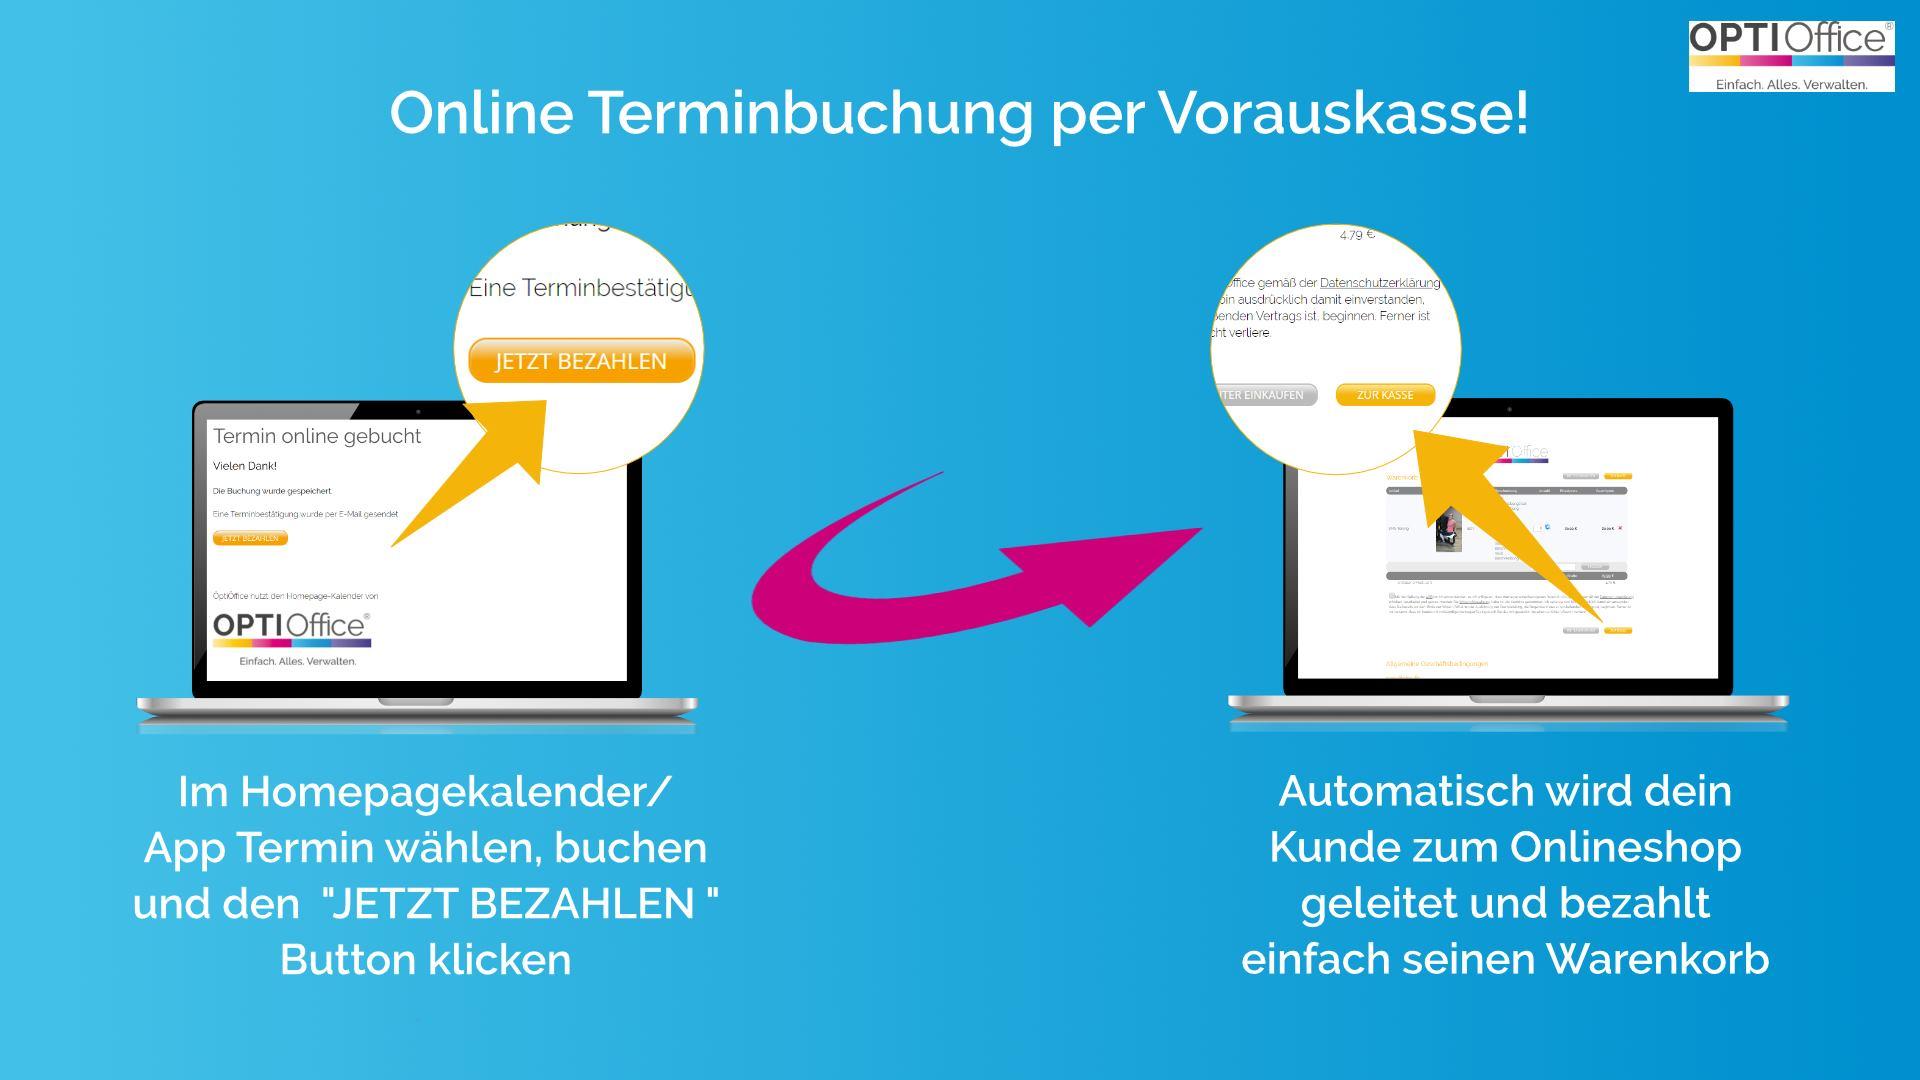 Update – Online Terminbuchung per Vorkasse!